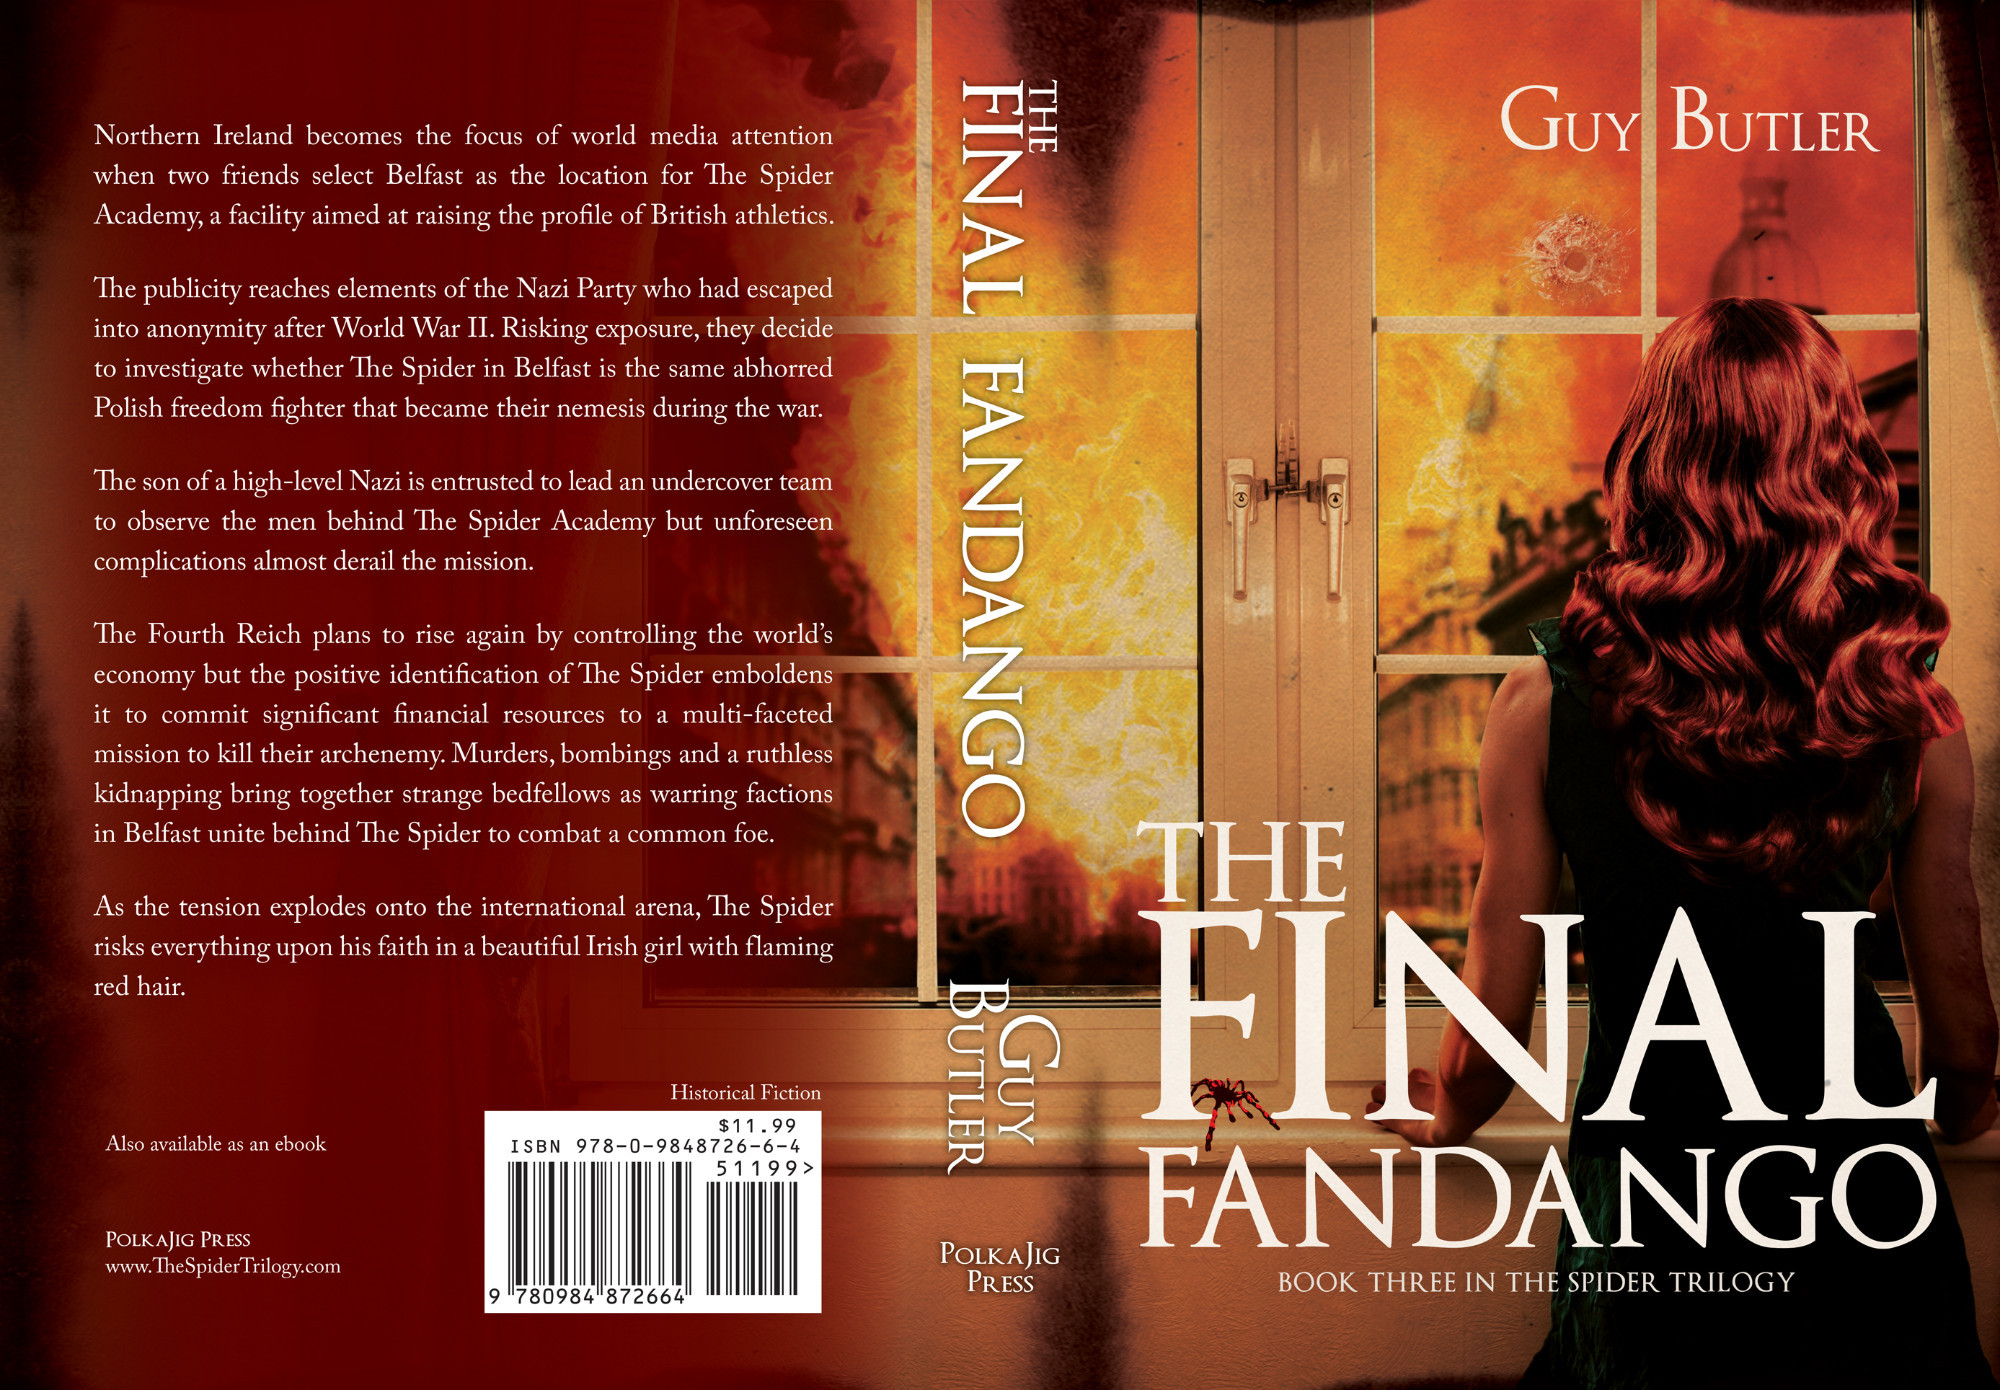 FinalFandango_CoverSpread_21915_575-144.jpg